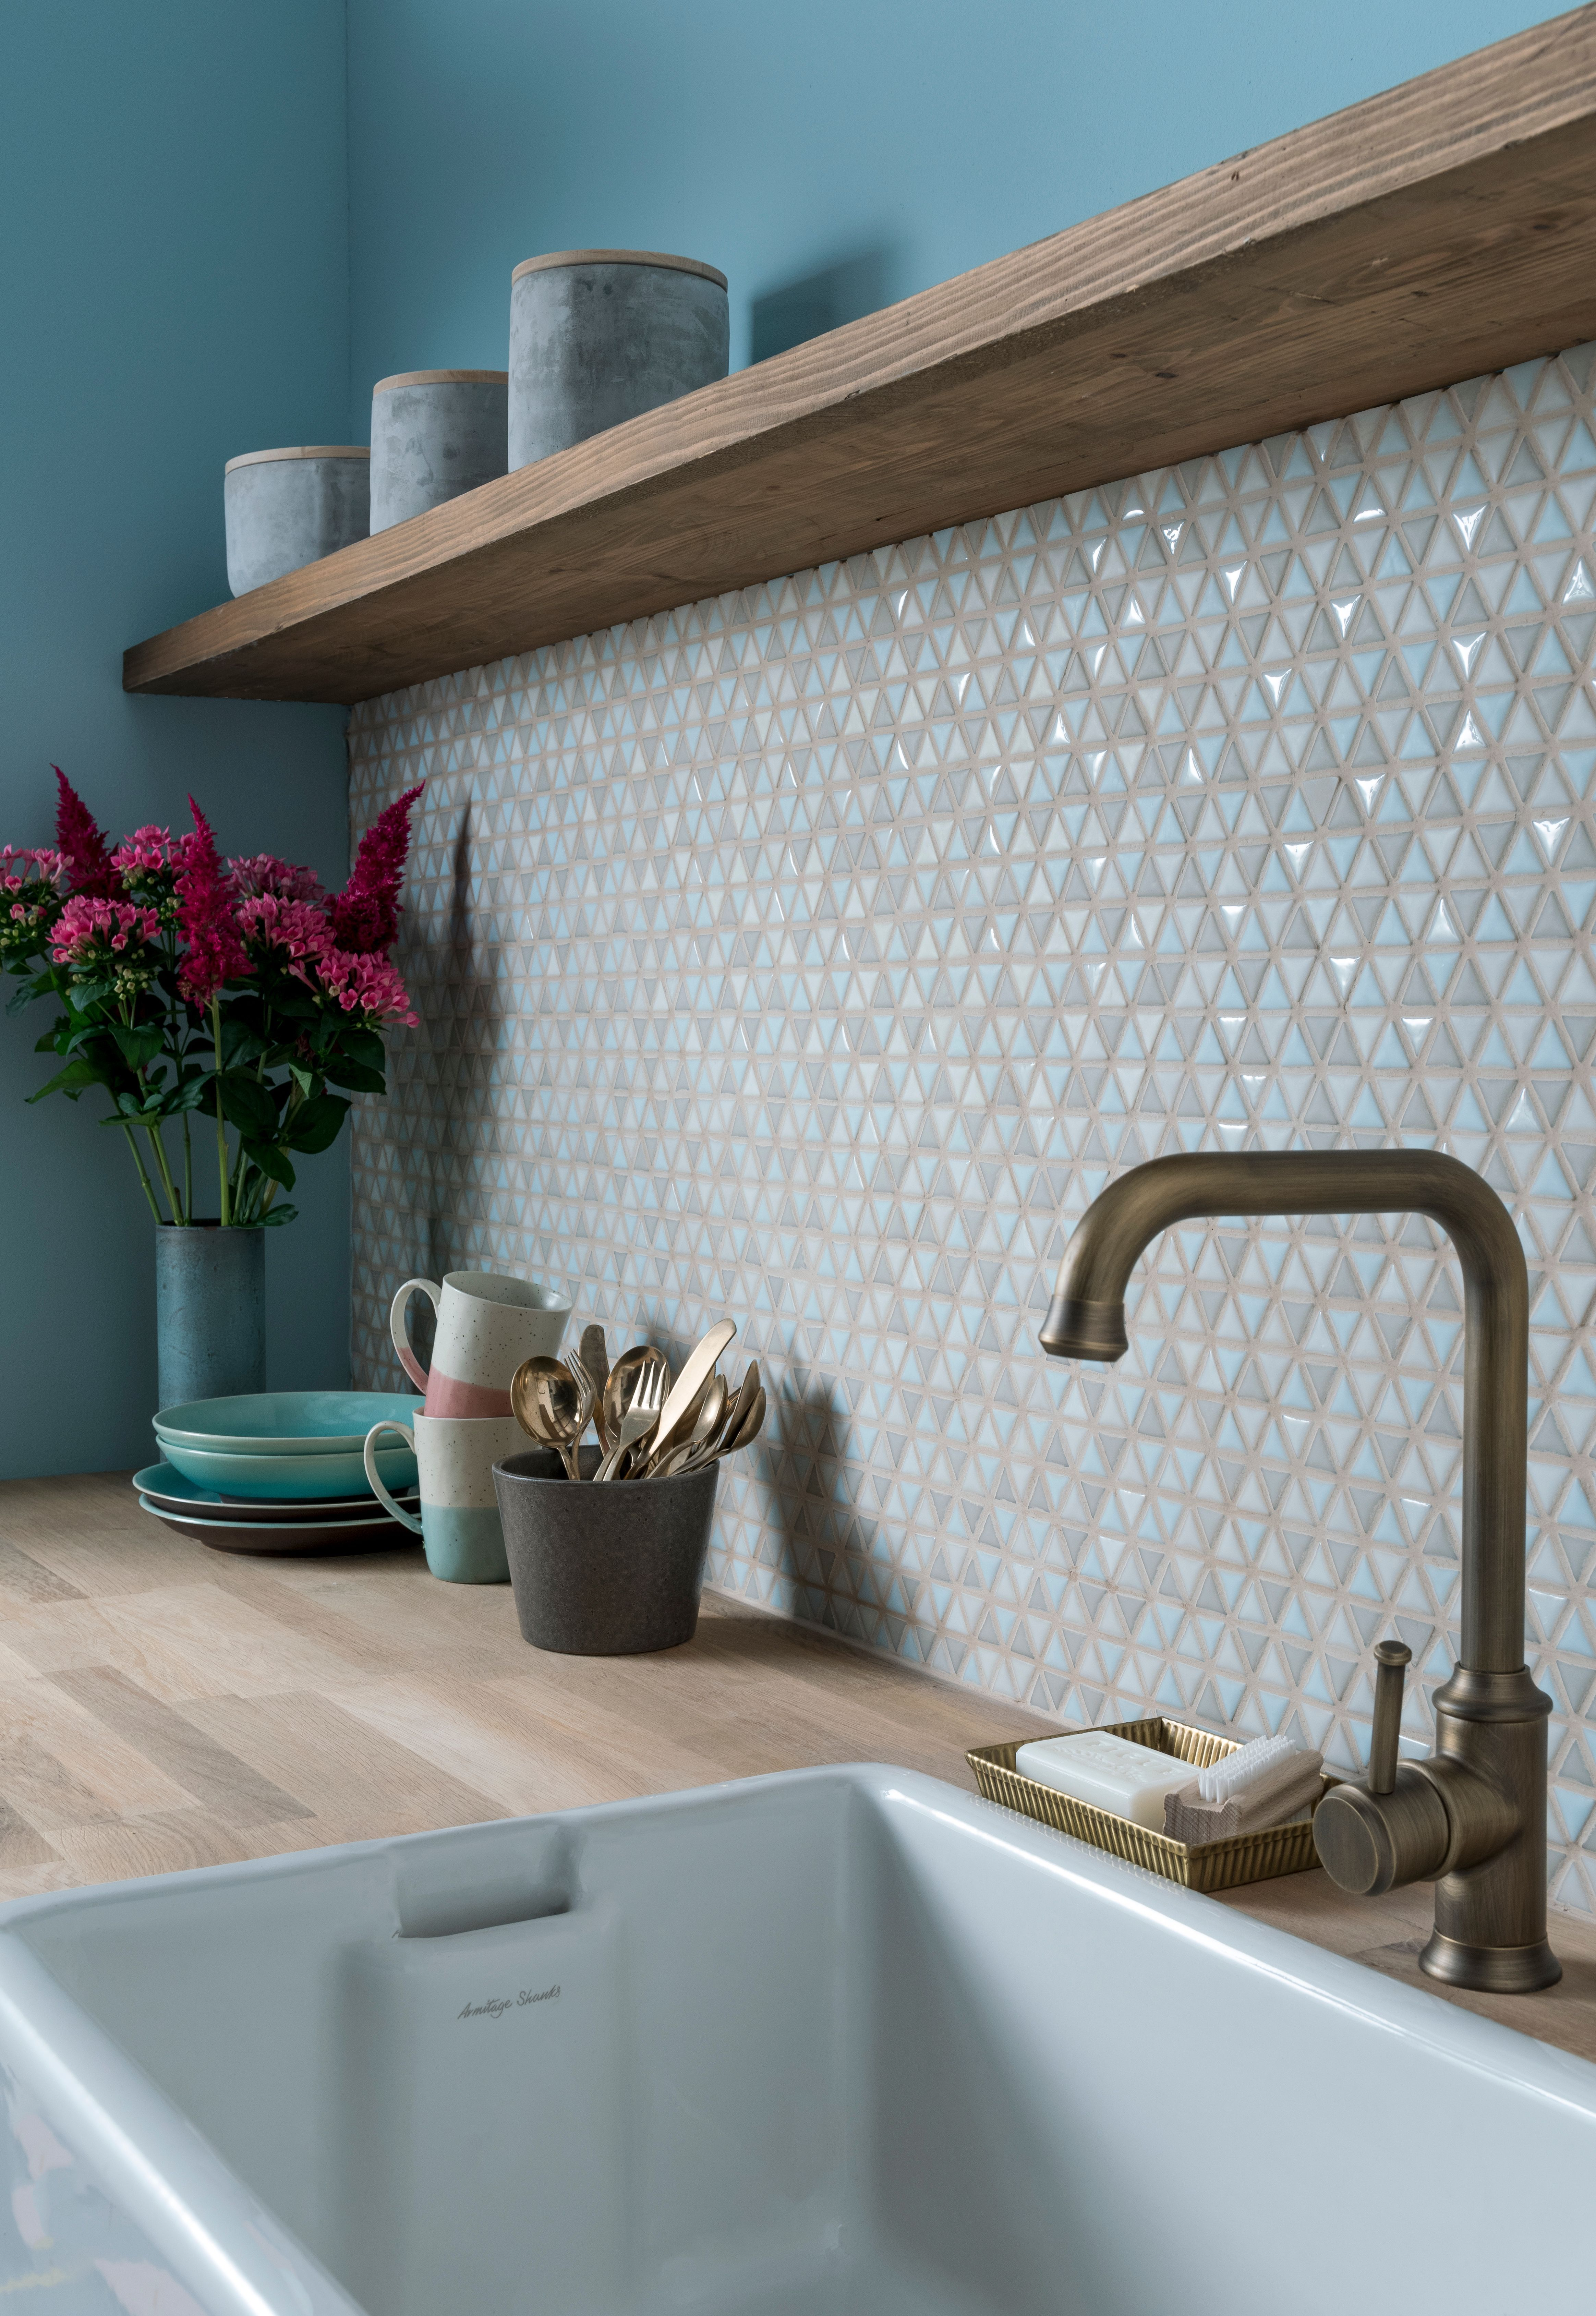 27 Beautiful Kitchen Splashback Ideas To Copy Kitchen Splashback Kitchen Wall Tiles Earthy Kitchen